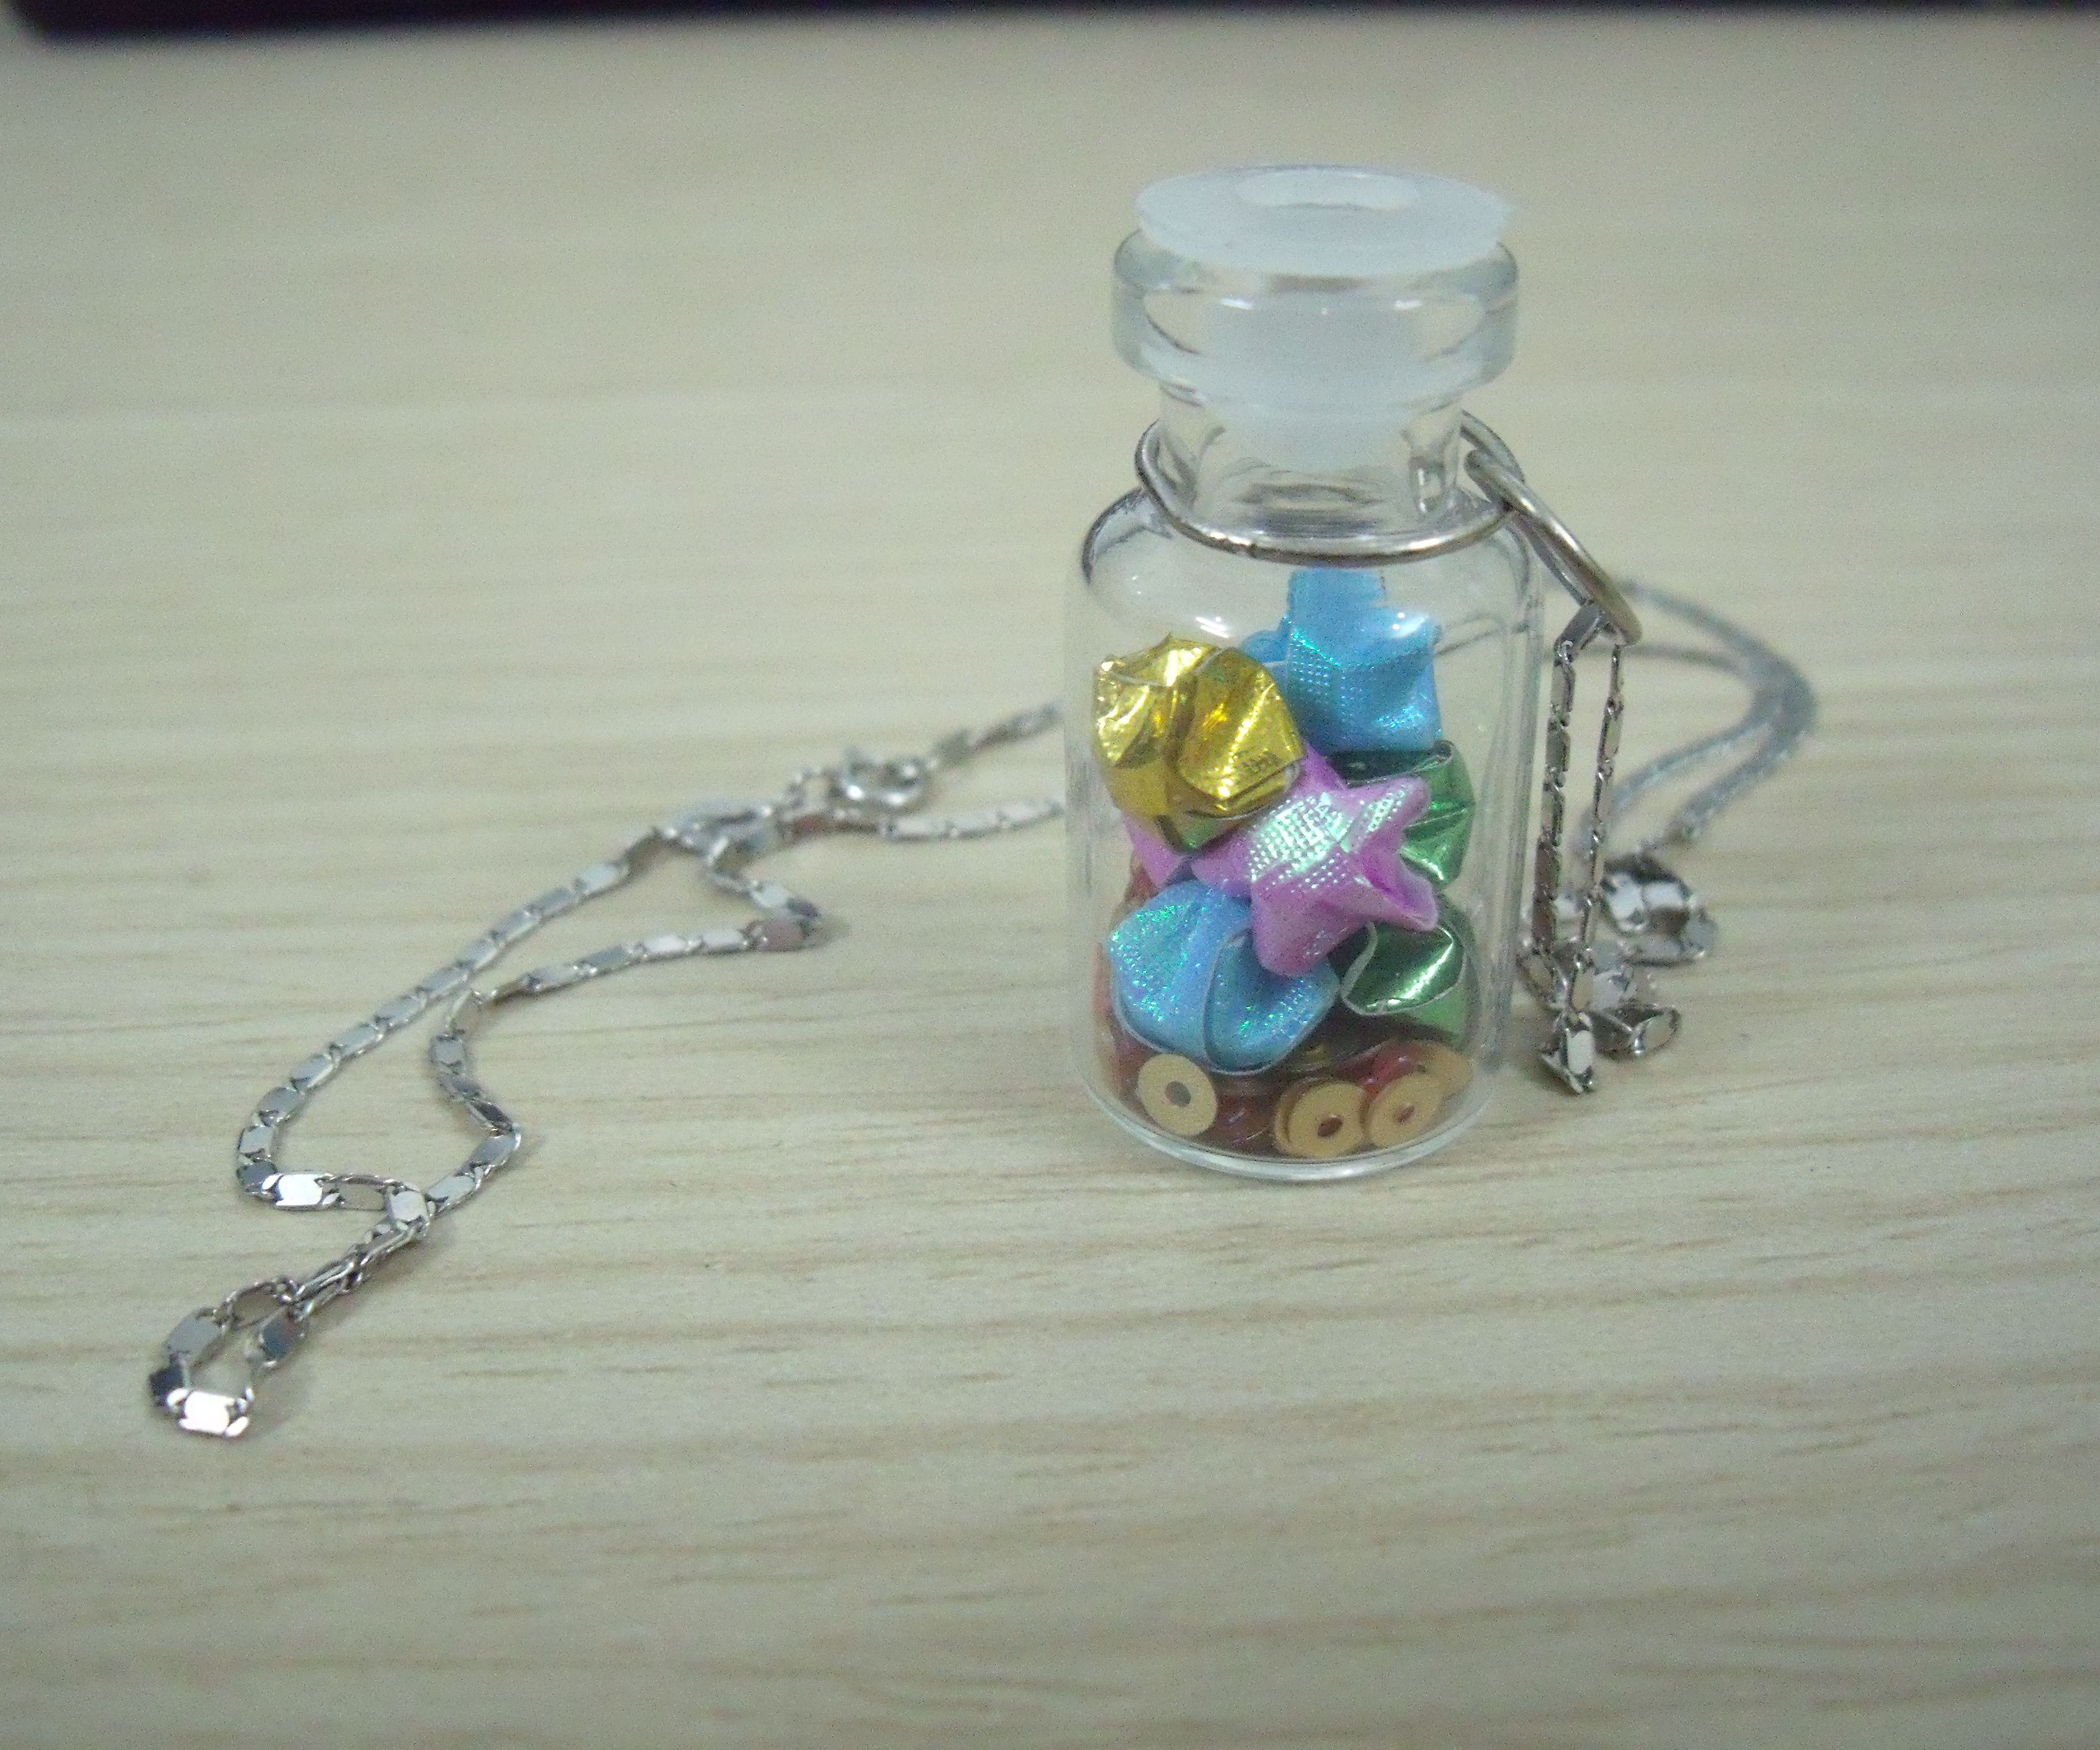 Mini paper wishing star bottle necklace/charm